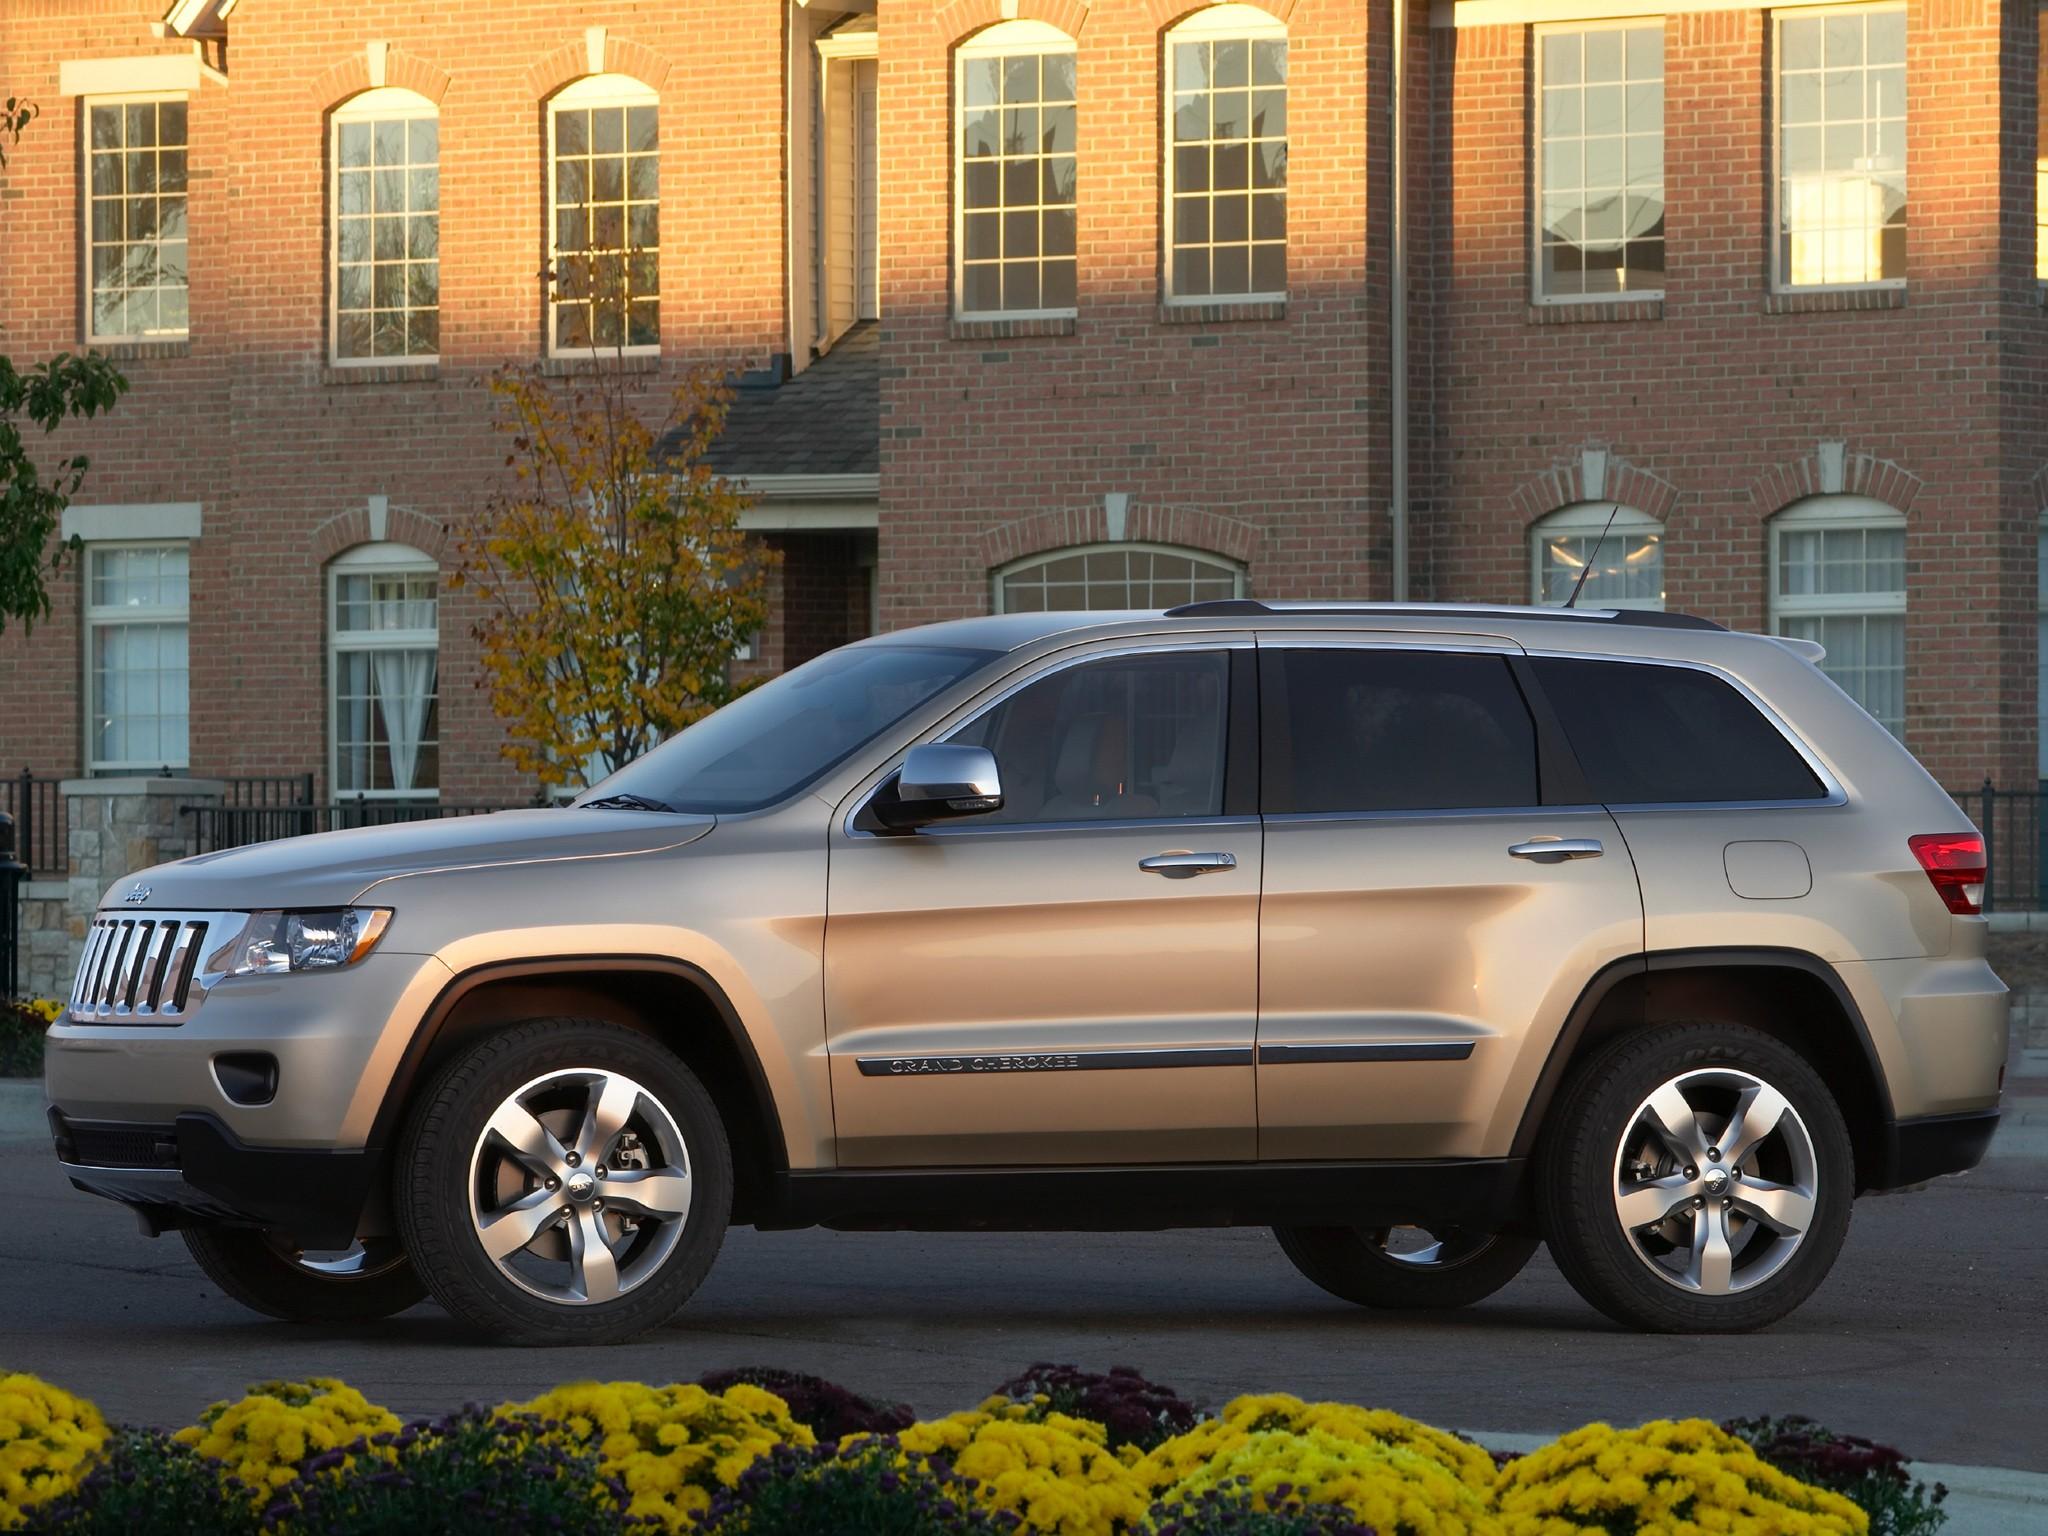 jeep grand cherokee specs 2010 2011 2012 2013 autoevolution. Black Bedroom Furniture Sets. Home Design Ideas